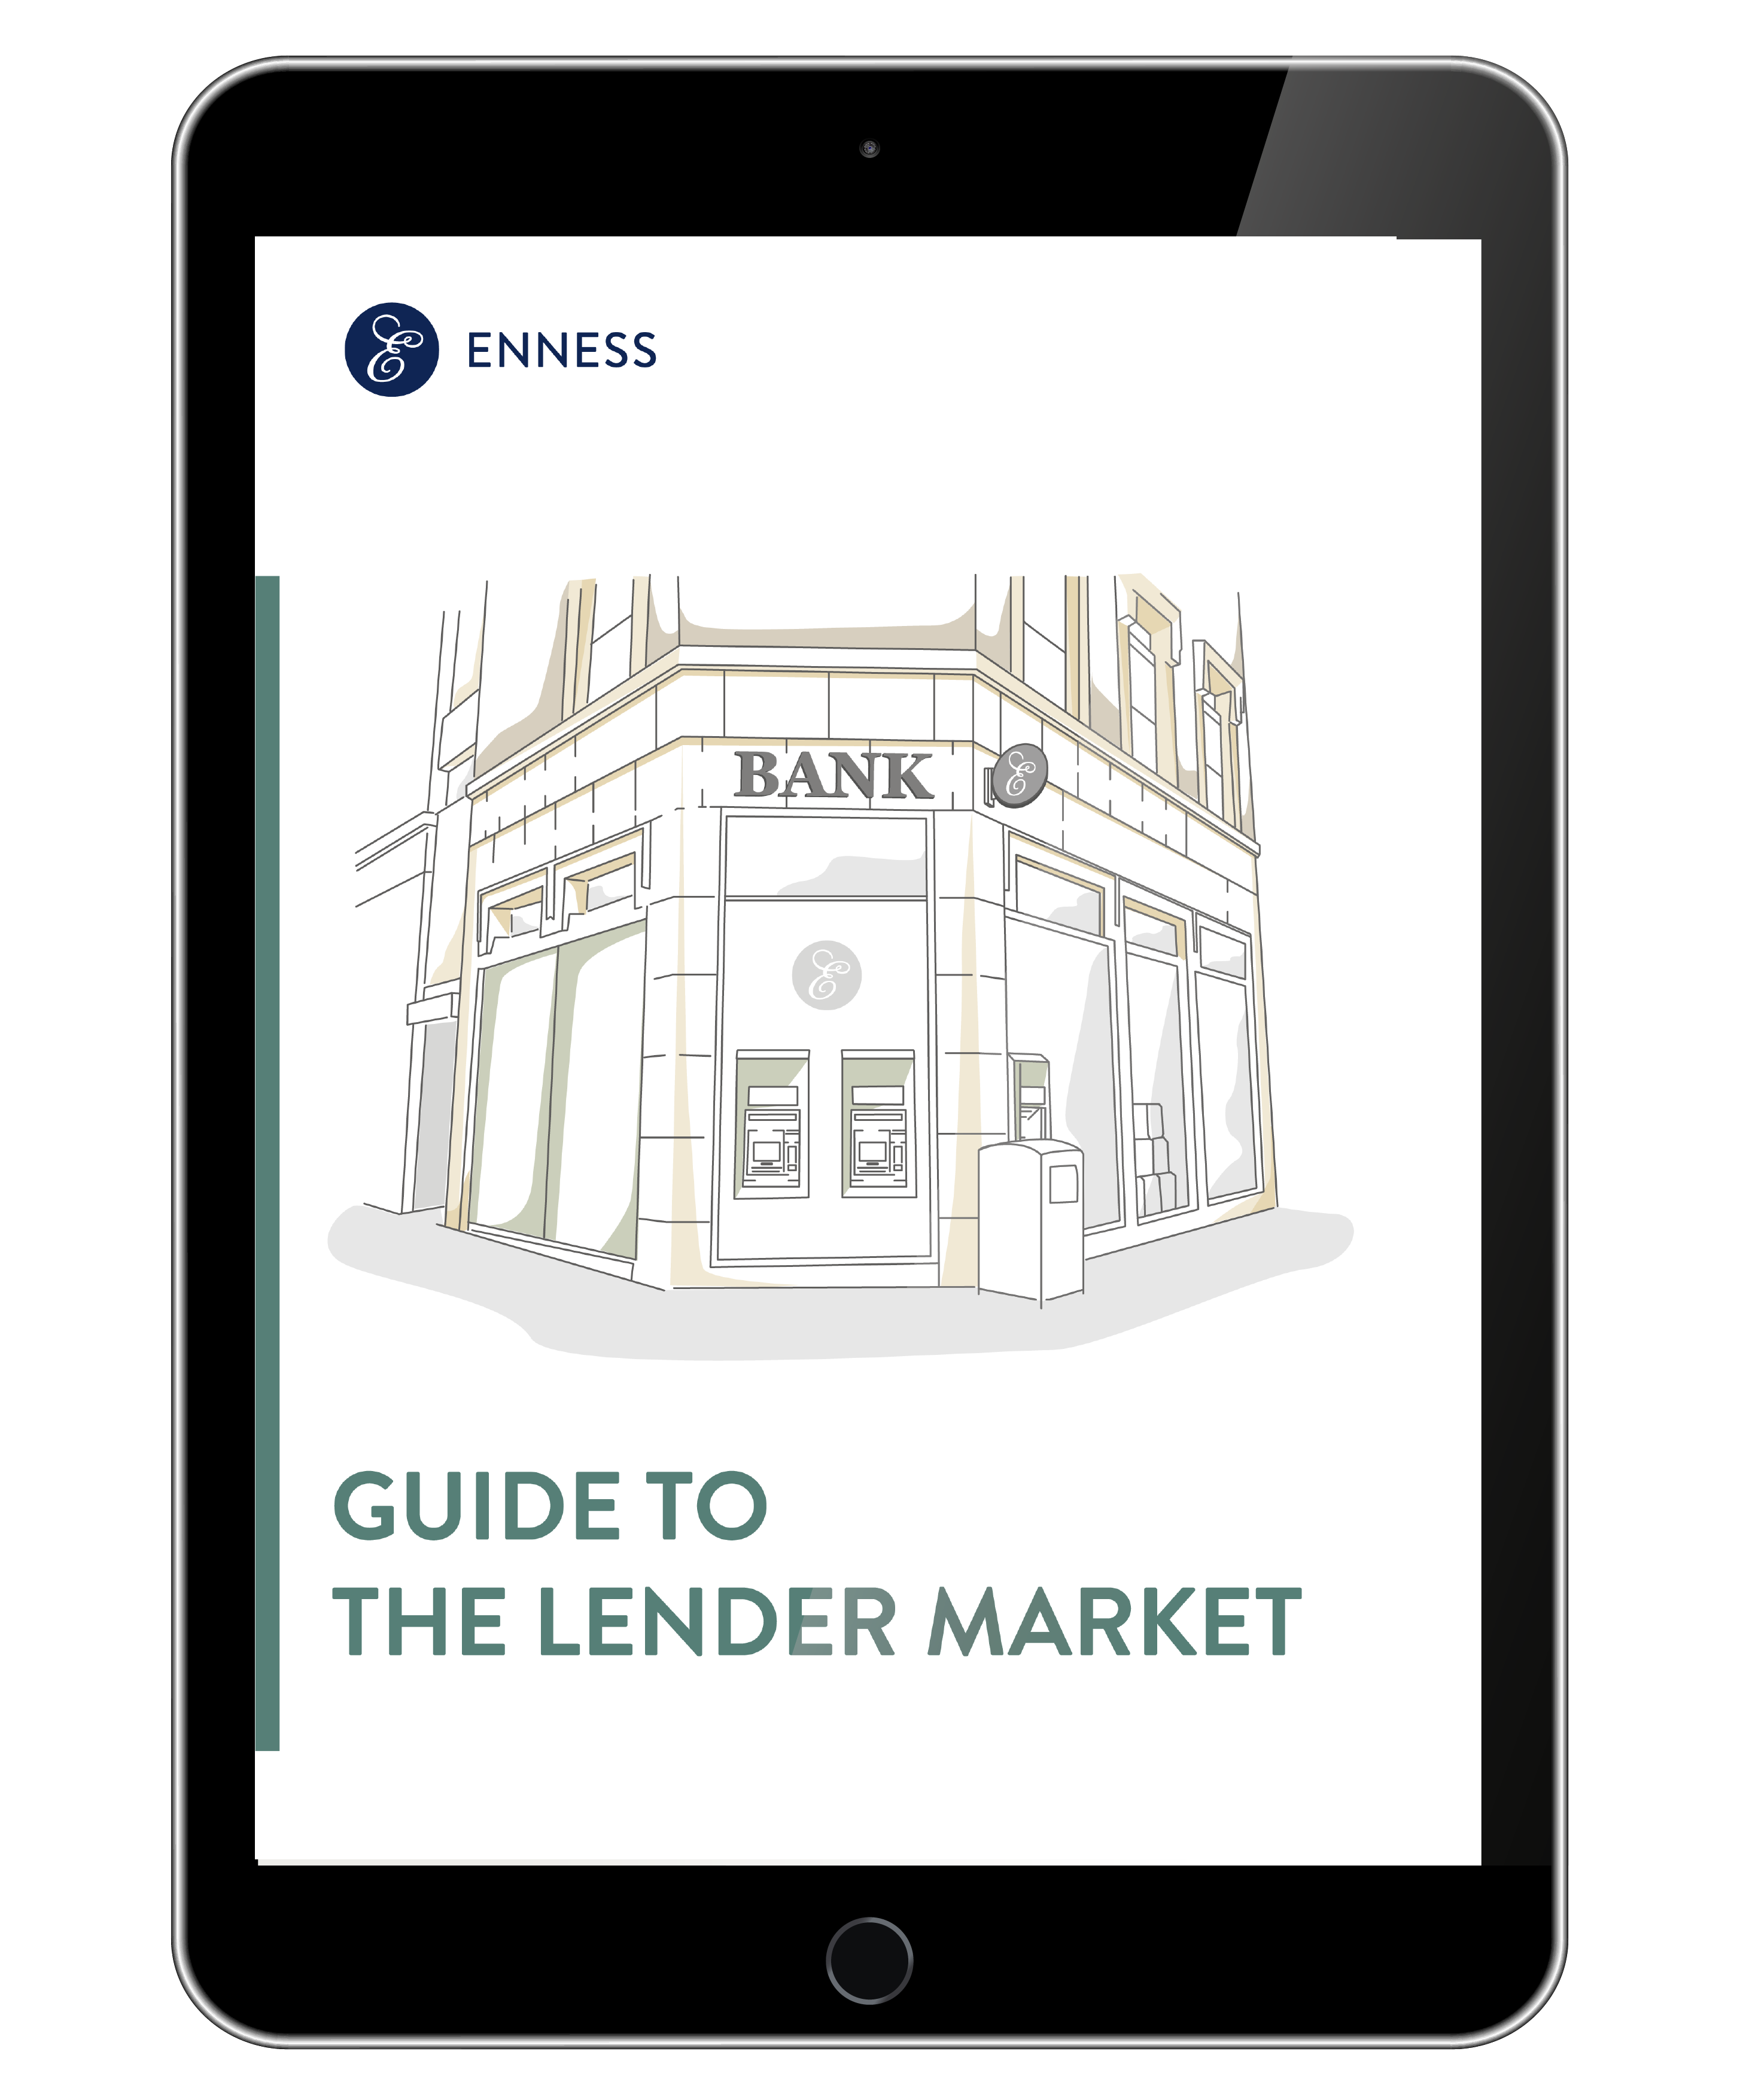 guide to lender market-01